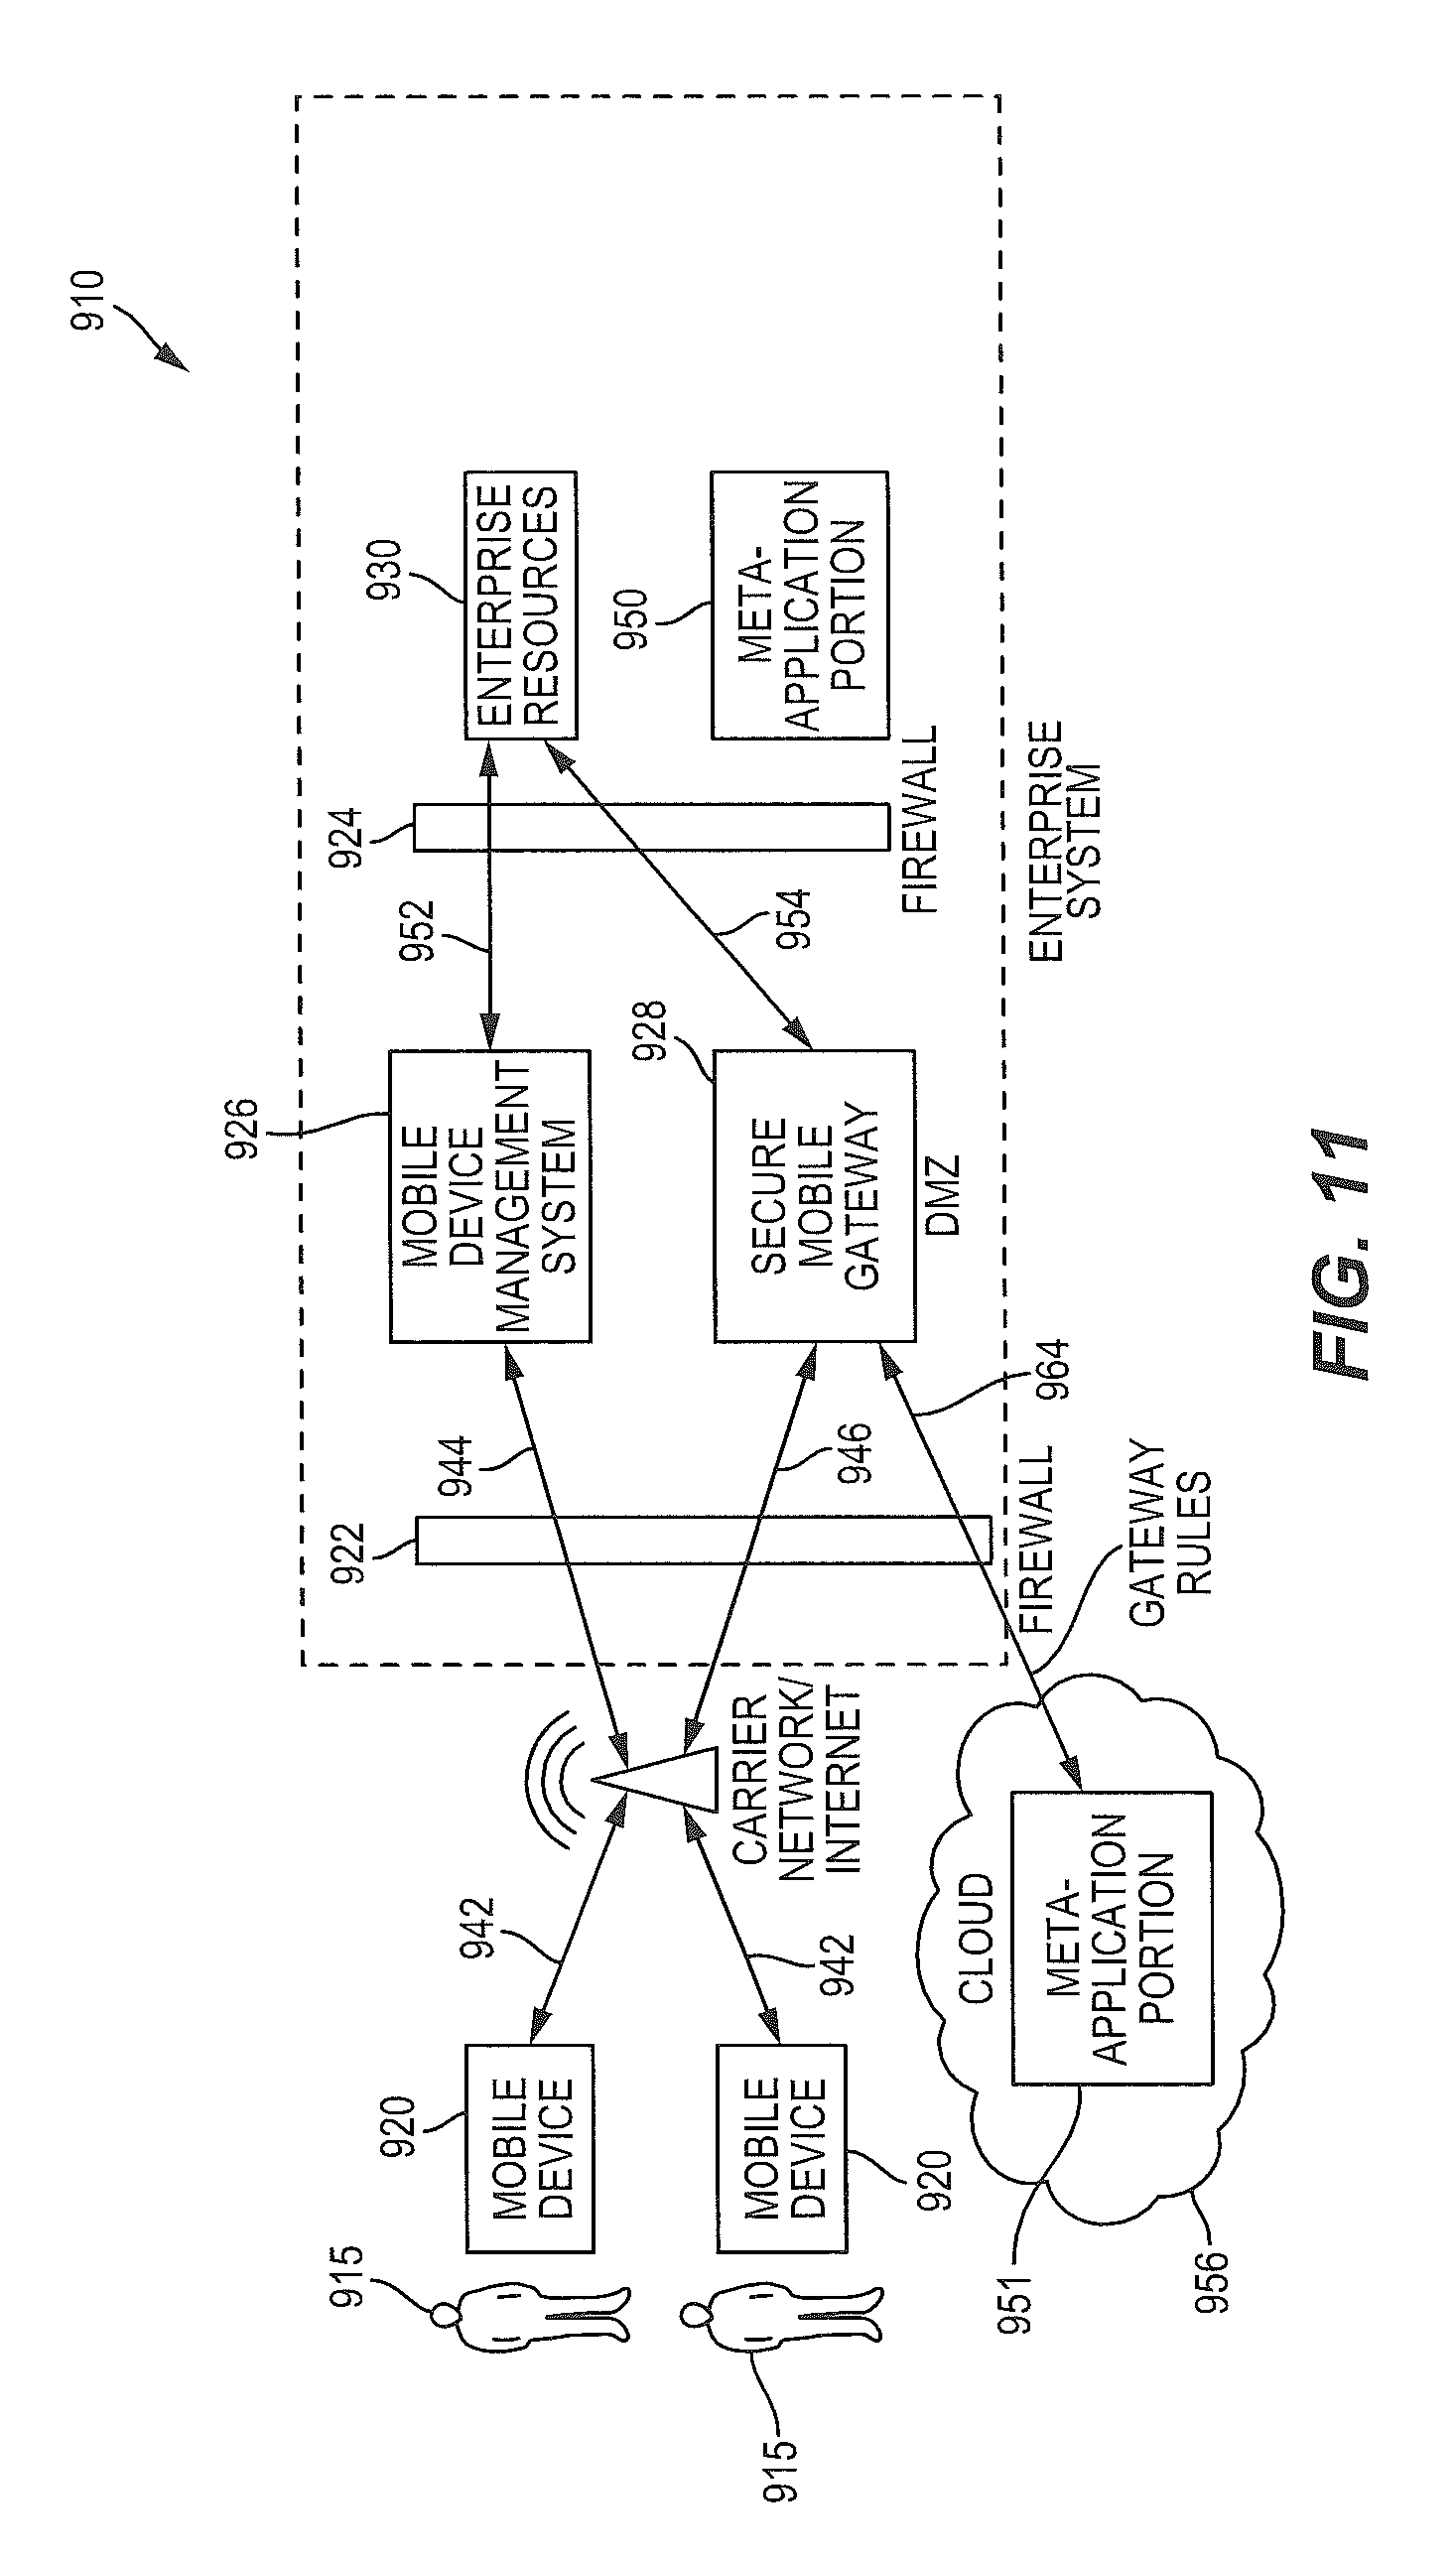 Patent US 9,521,147 B2 on